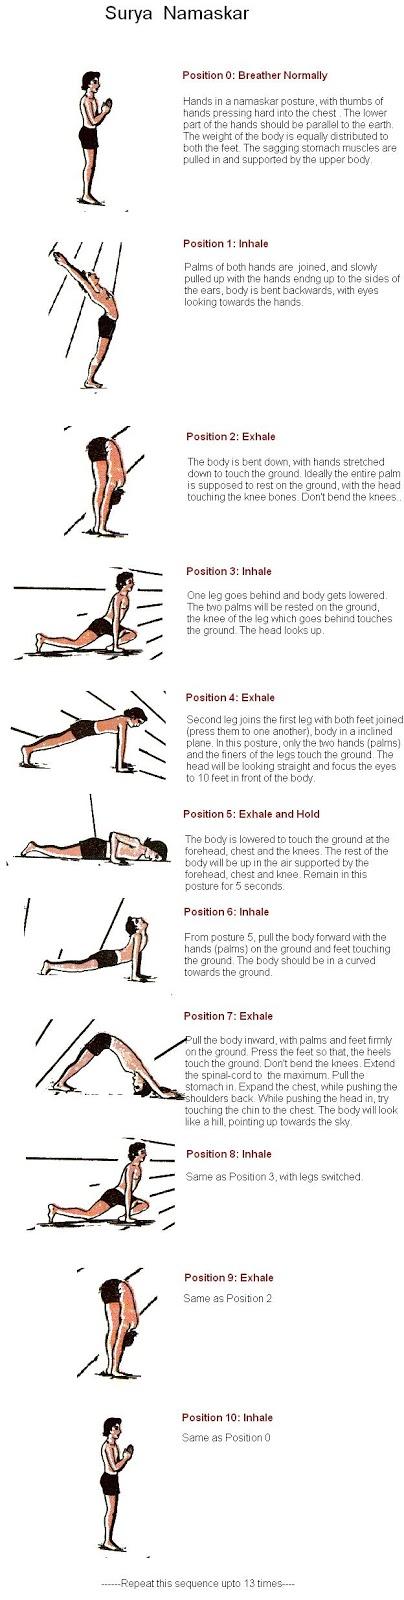 surya namaskar weight loss pdf